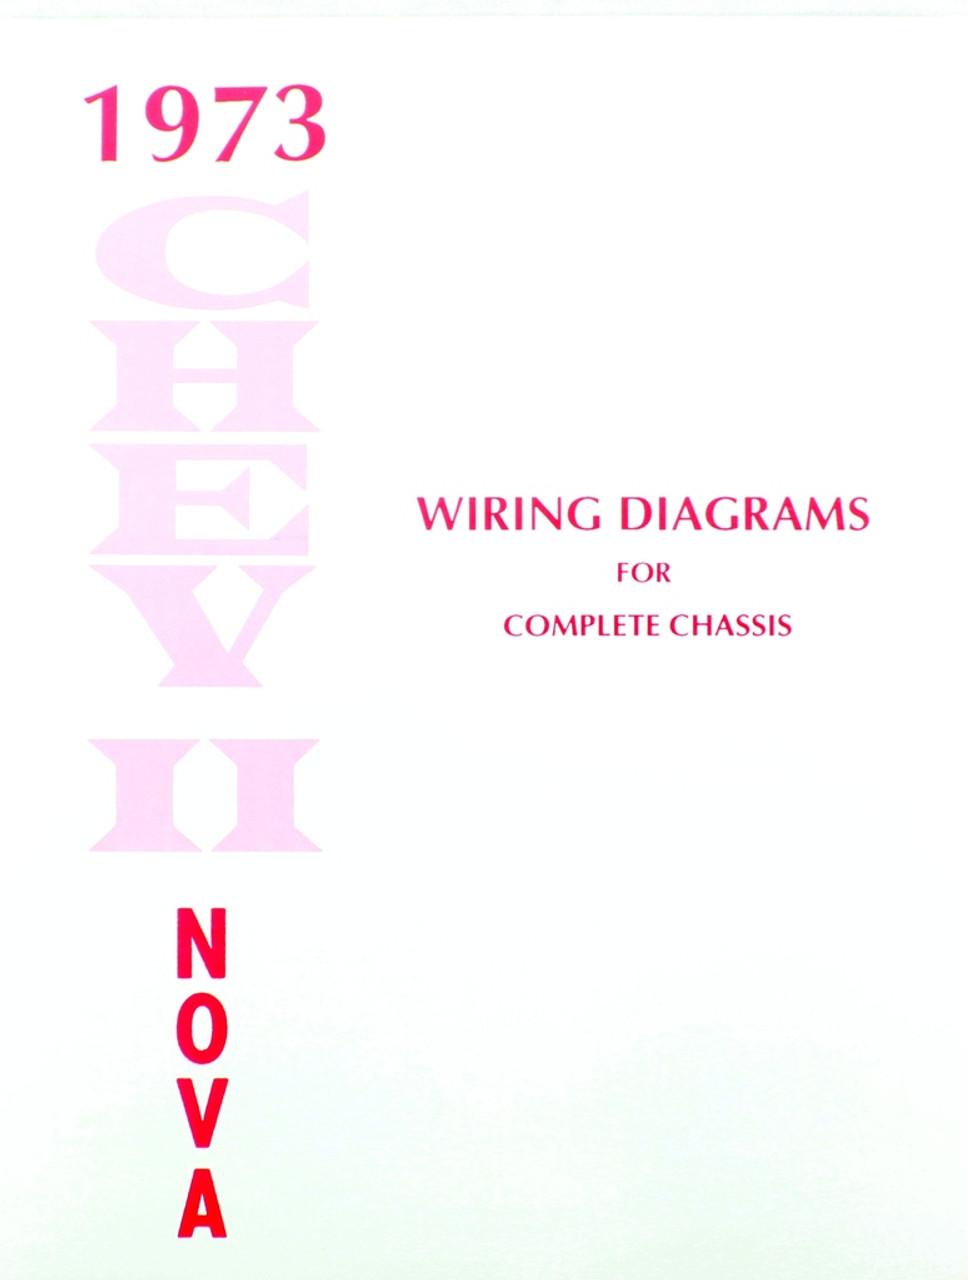 1970 Chevy C10 Fuse Box Diagram Moreover 1970 Chevelle Wiring Diagram